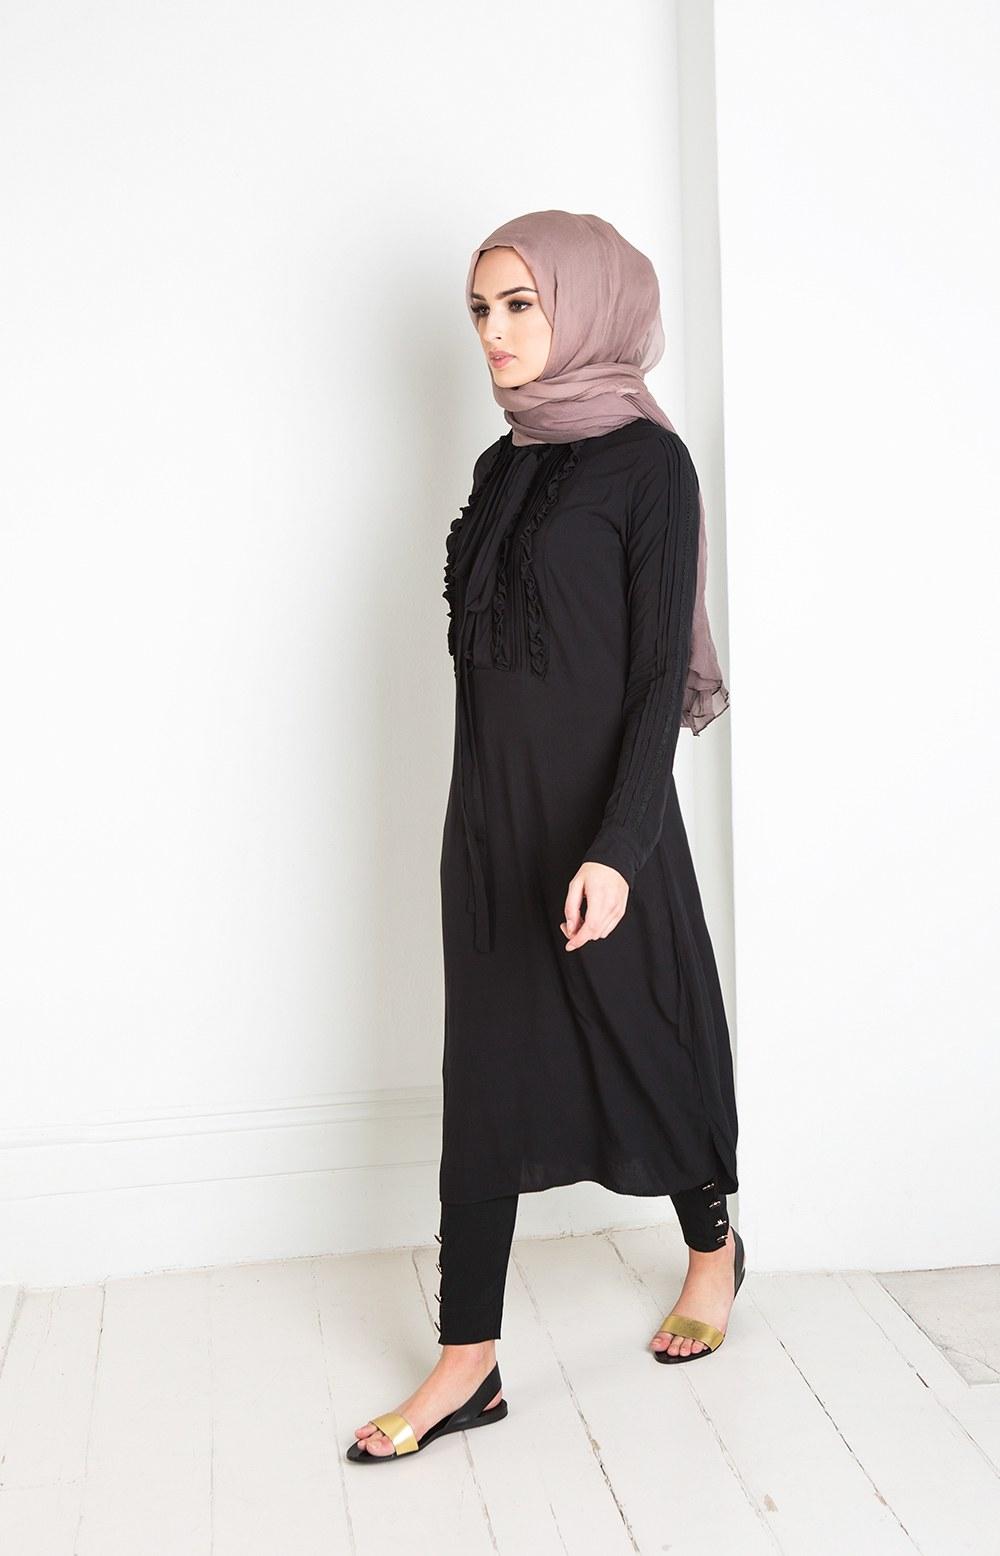 Model Model Baju Lebaran 2018 Wanita D0dg 25 Trend Model Baju Muslim Lebaran 2018 Simple & Modis